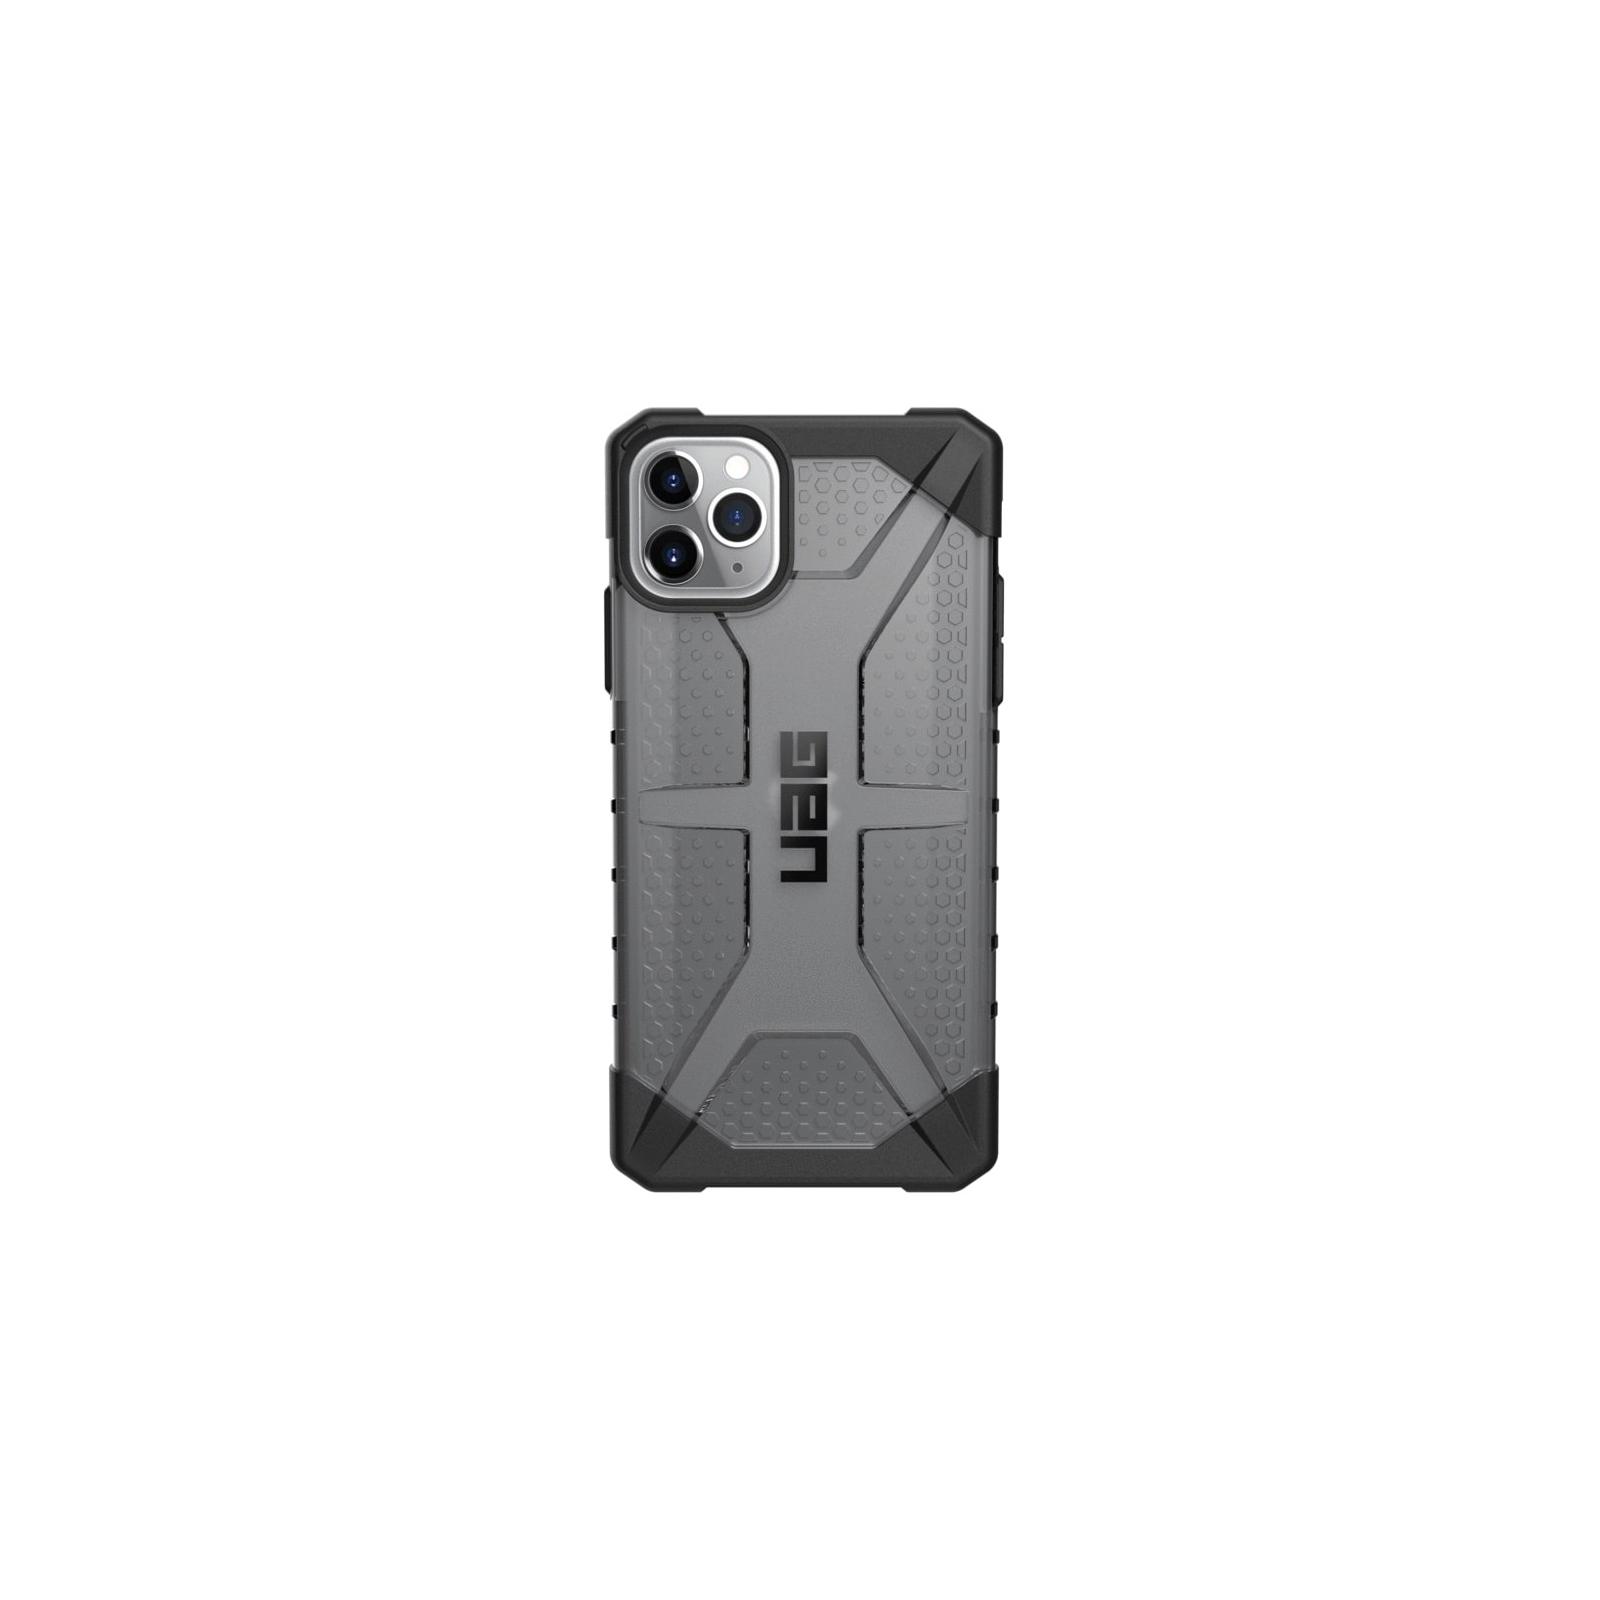 Чехол для моб. телефона Uag iPhone 11 Pro Max Plasma, Ice (111723114343)